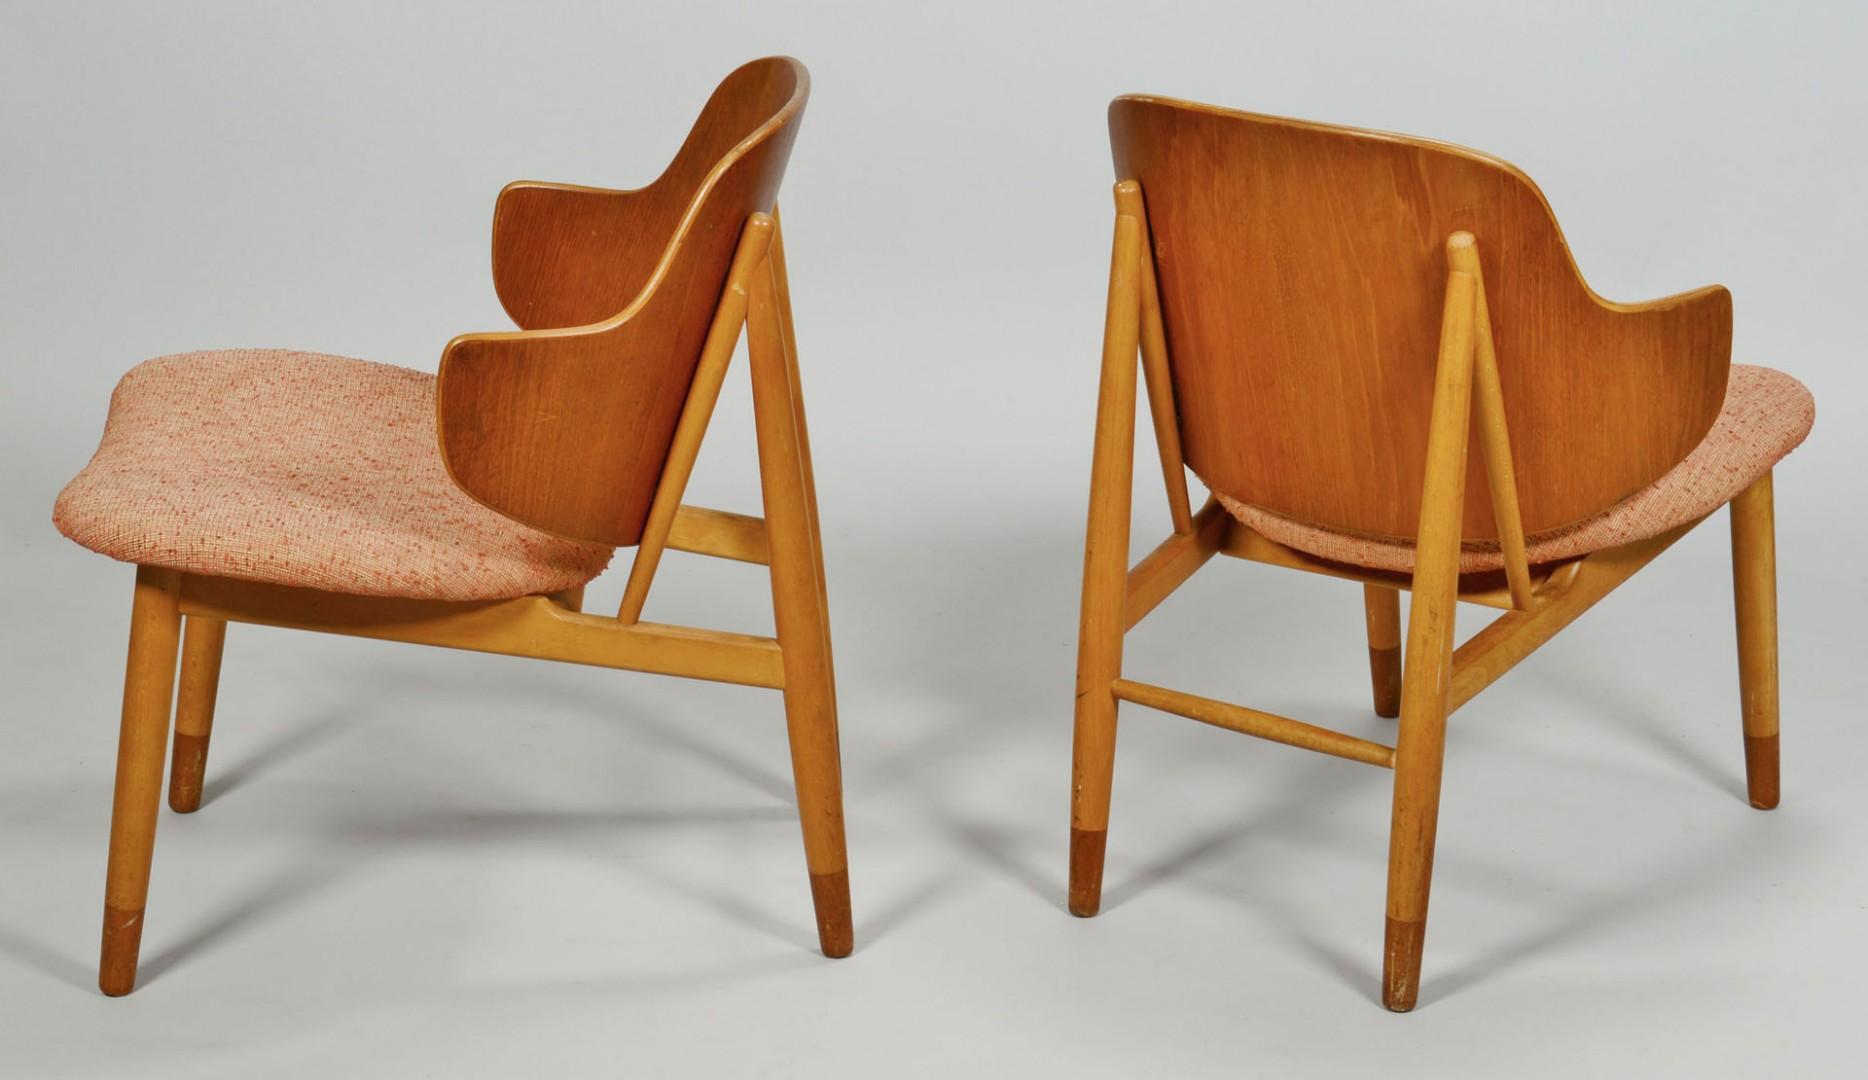 Lot 414: Set of 4 Danish Modern Rosewood Chairs